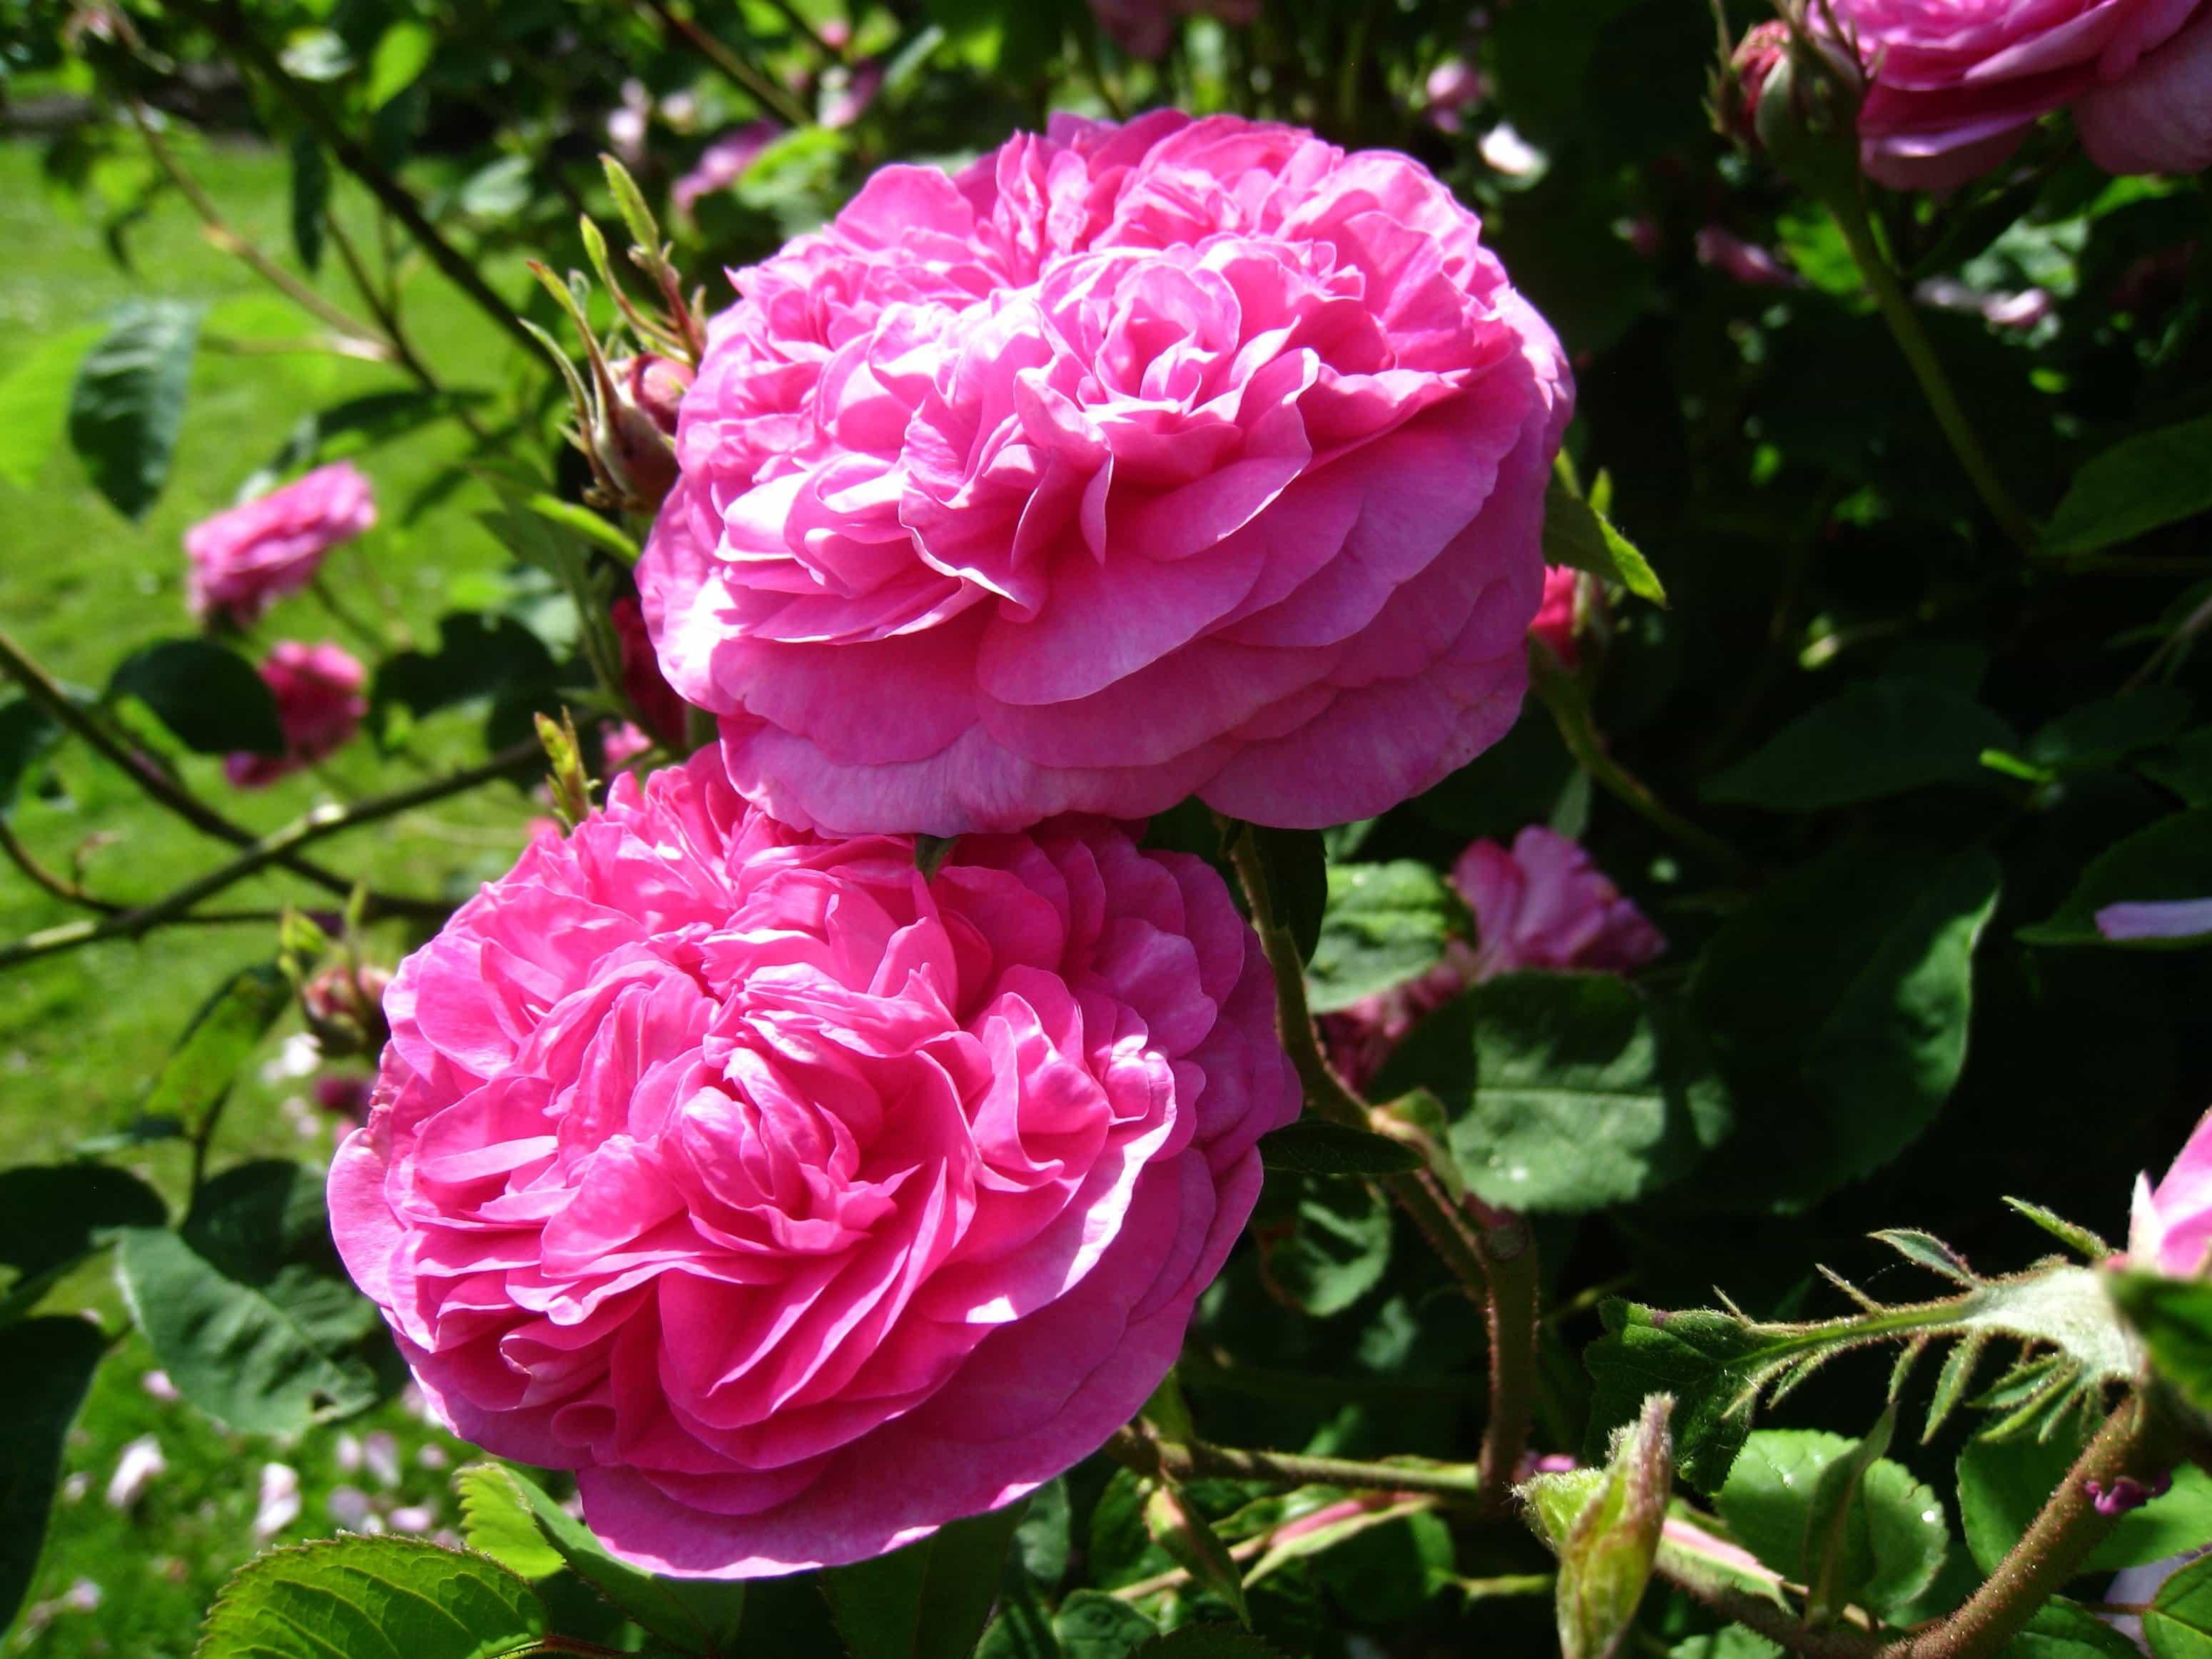 Imagen gratis jard n naturaleza flor hoja flora rosa for Pianta rosa